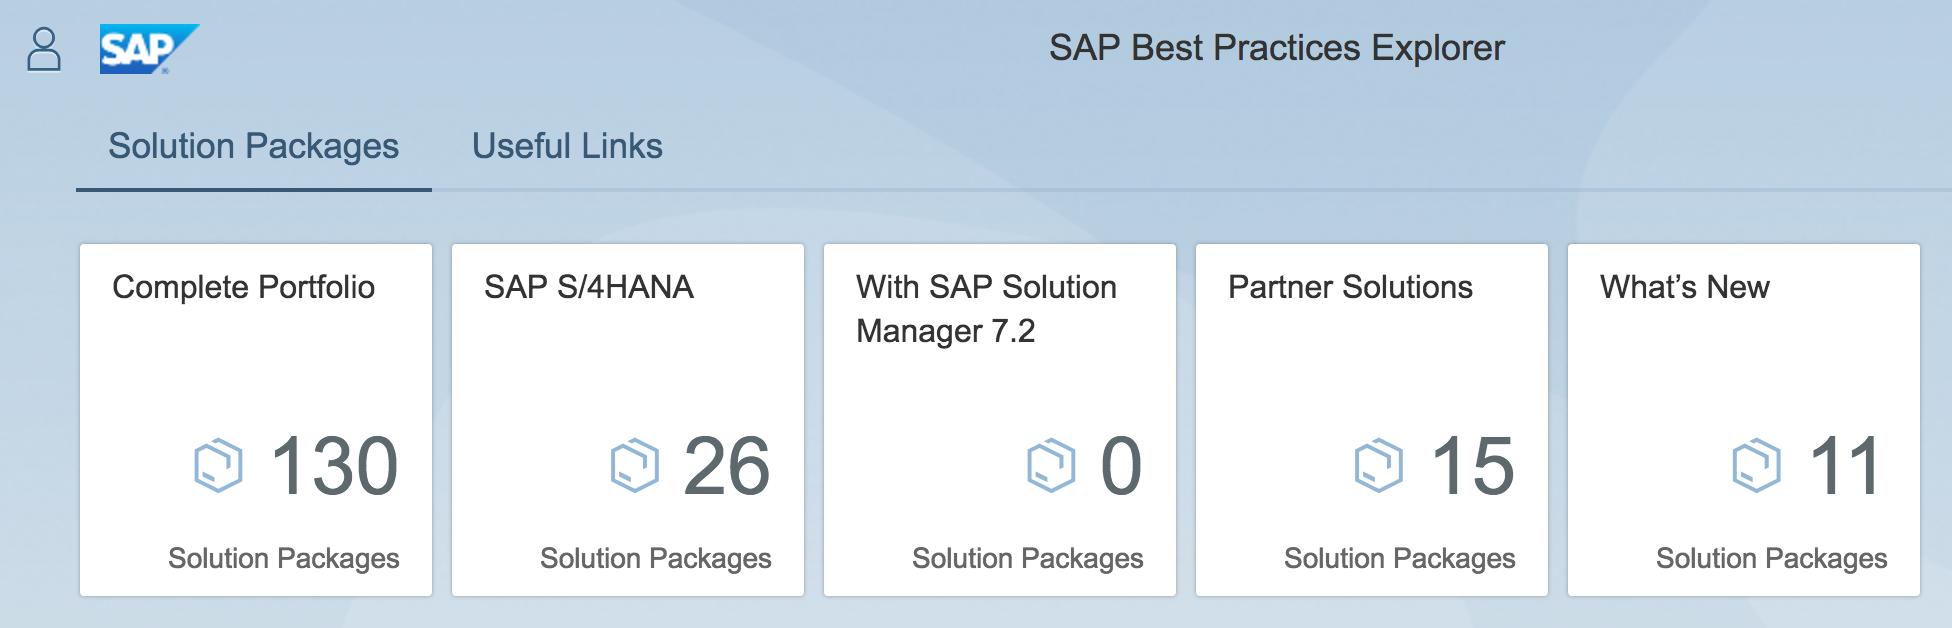 SAP Best Practices Explorer